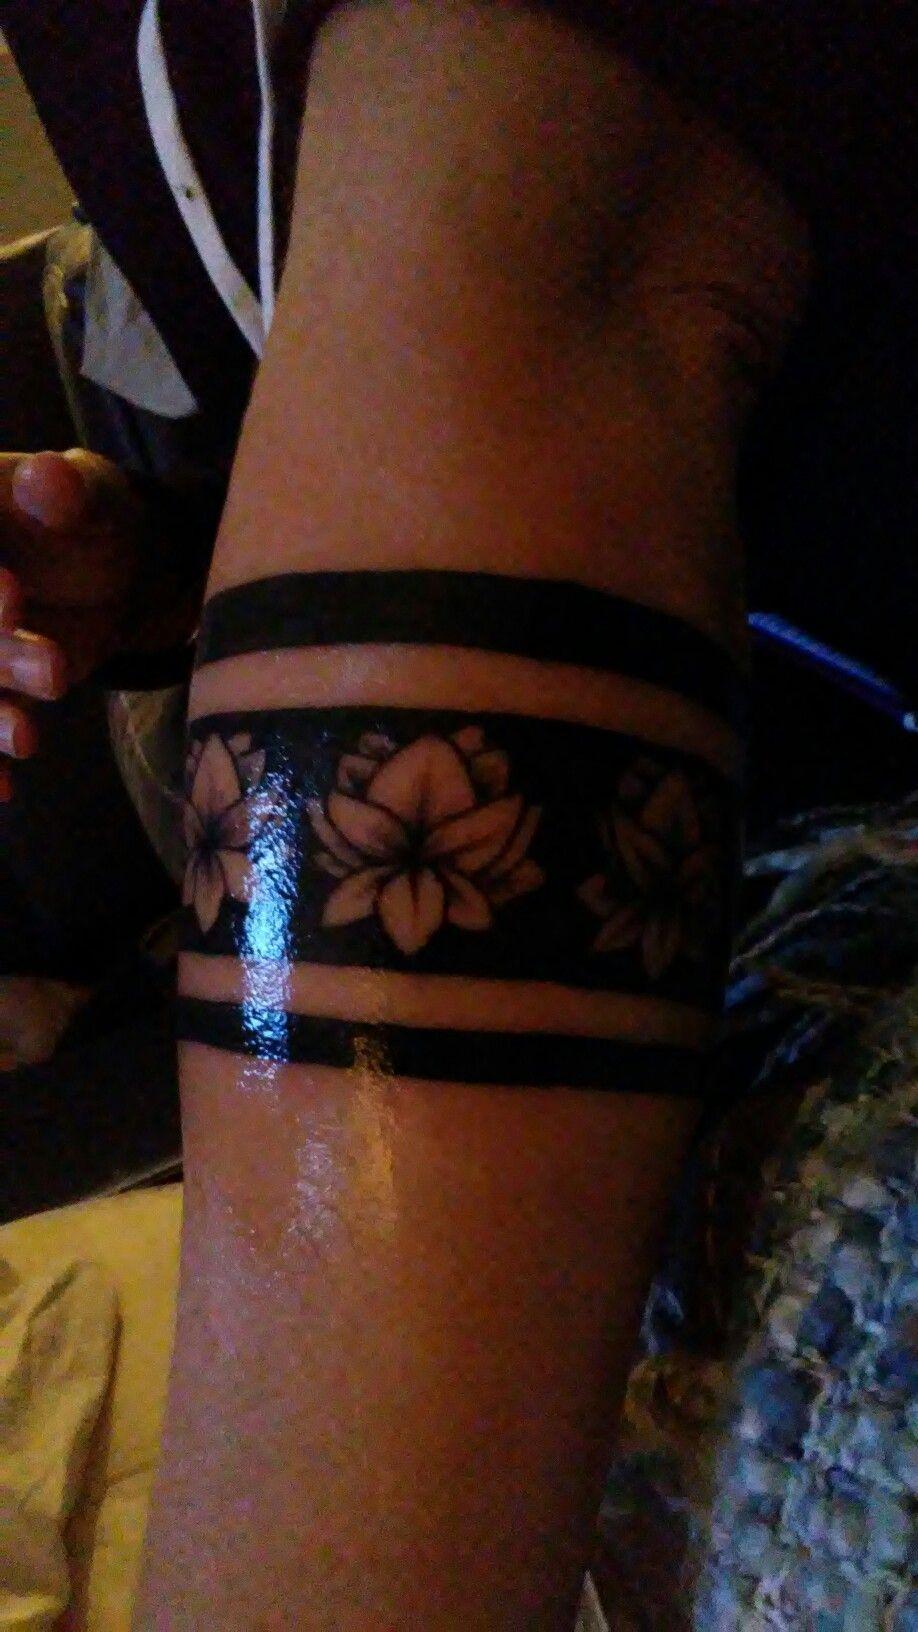 Lotus flower band tattoo tattoos pinterest band tattoo and tattoo lotus flower band tattoo mightylinksfo